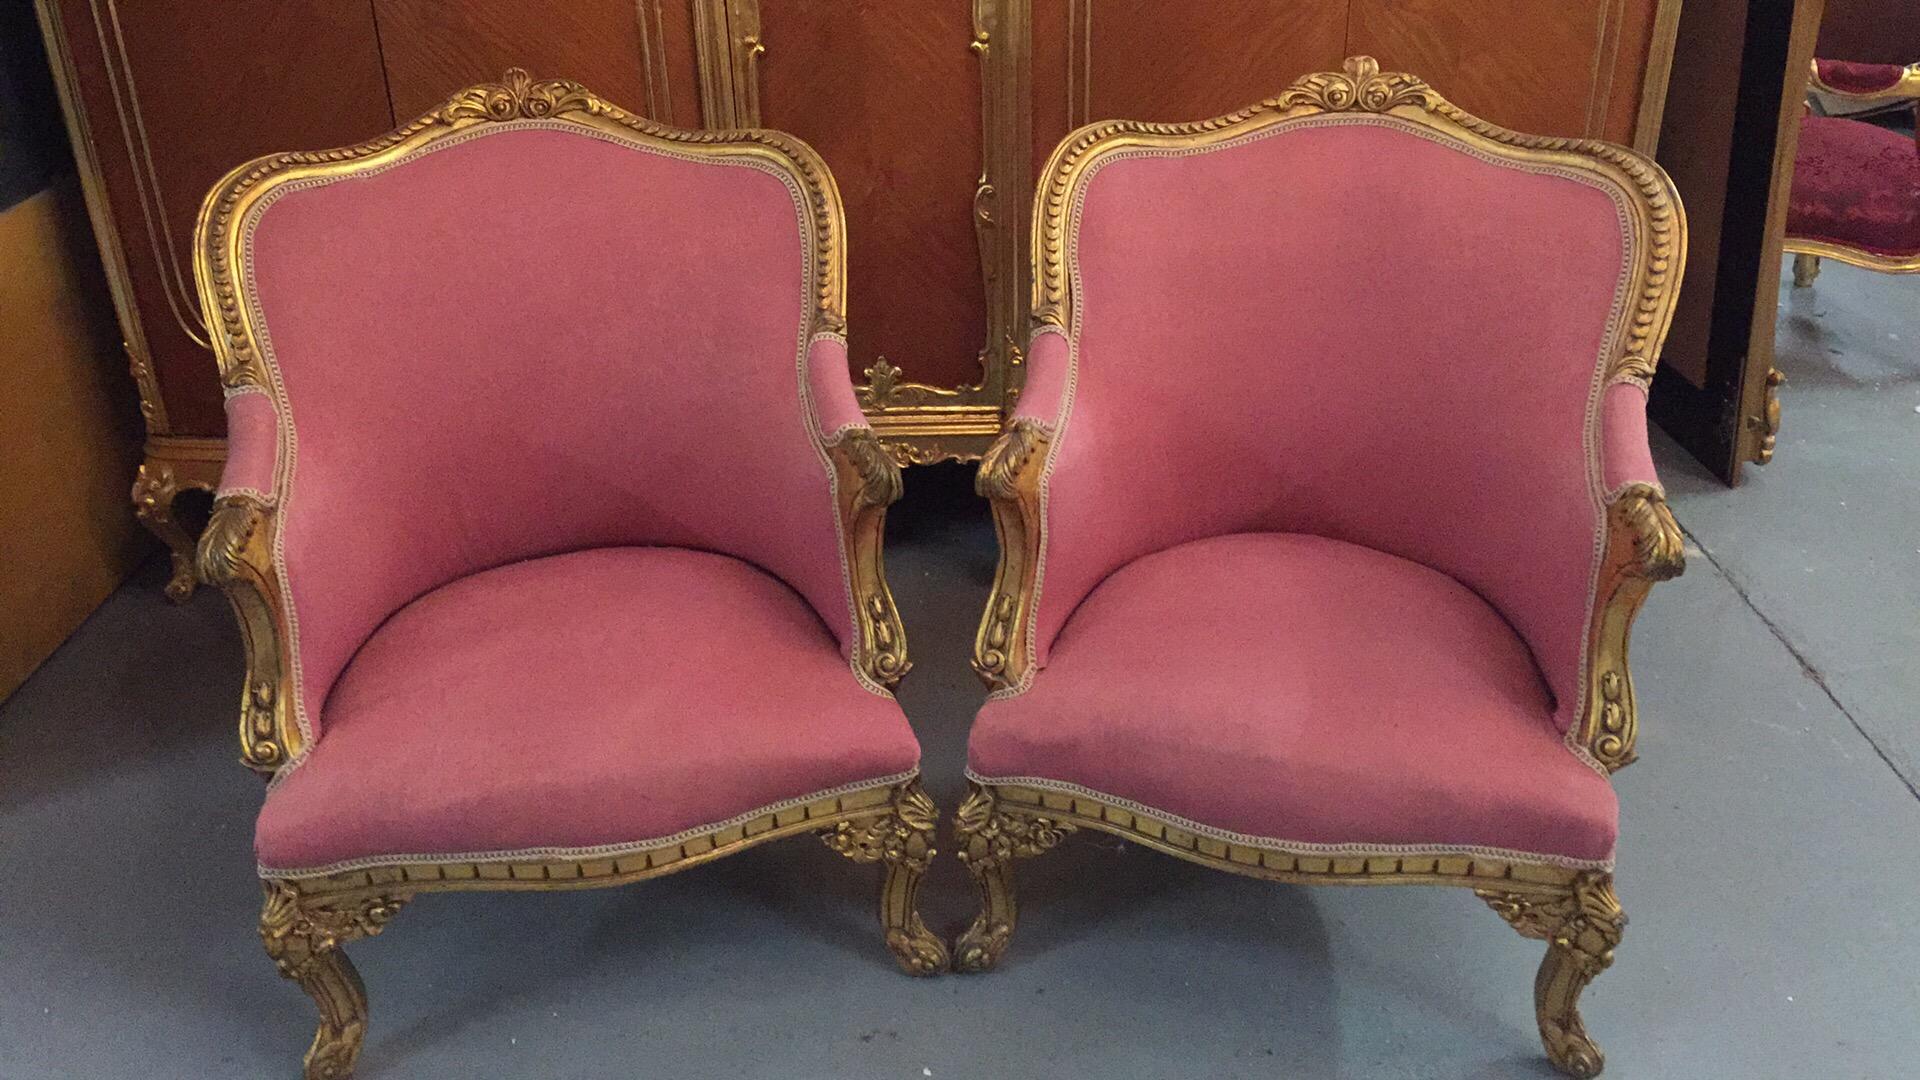 Renaissance Antique Furniture and Lighting Warehouse Dublin Ireland antiques sofa